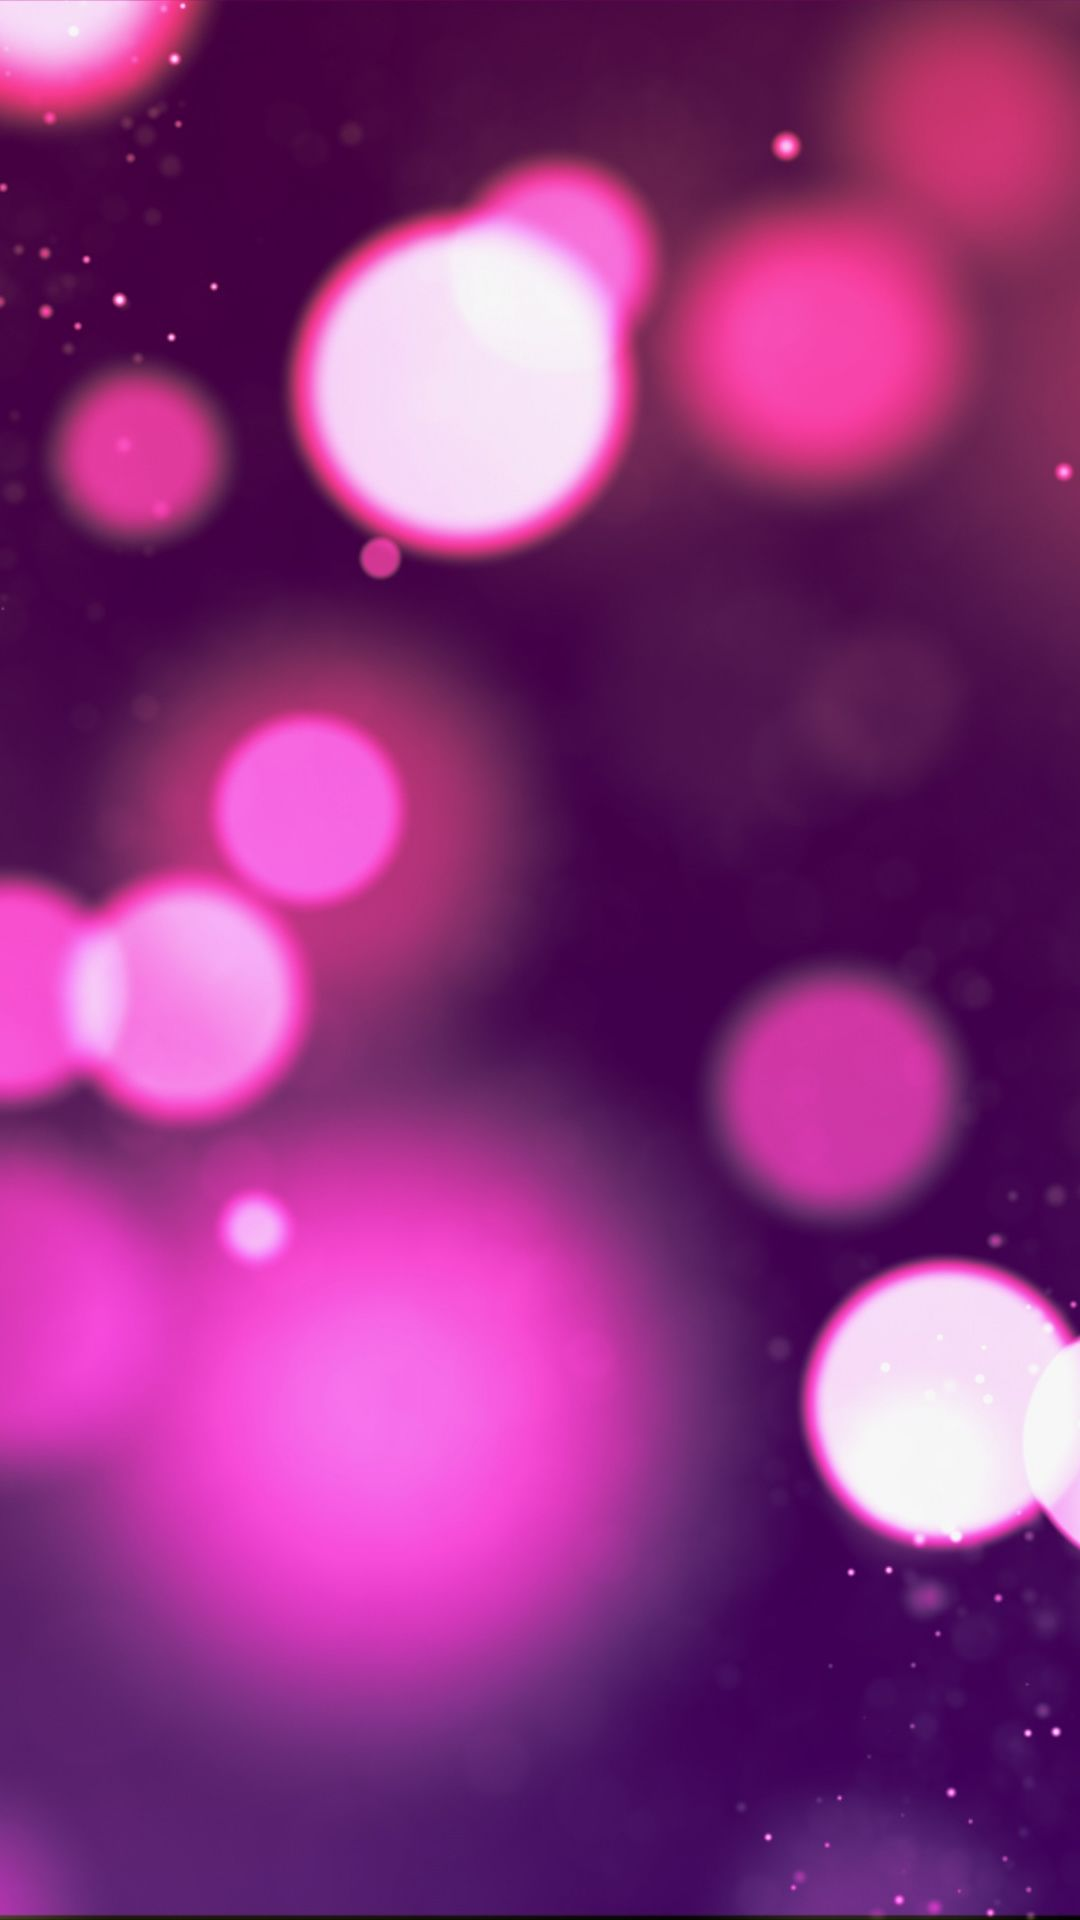 Downaload Bokeh Lights Purple And Pink Blur Wallpaper For